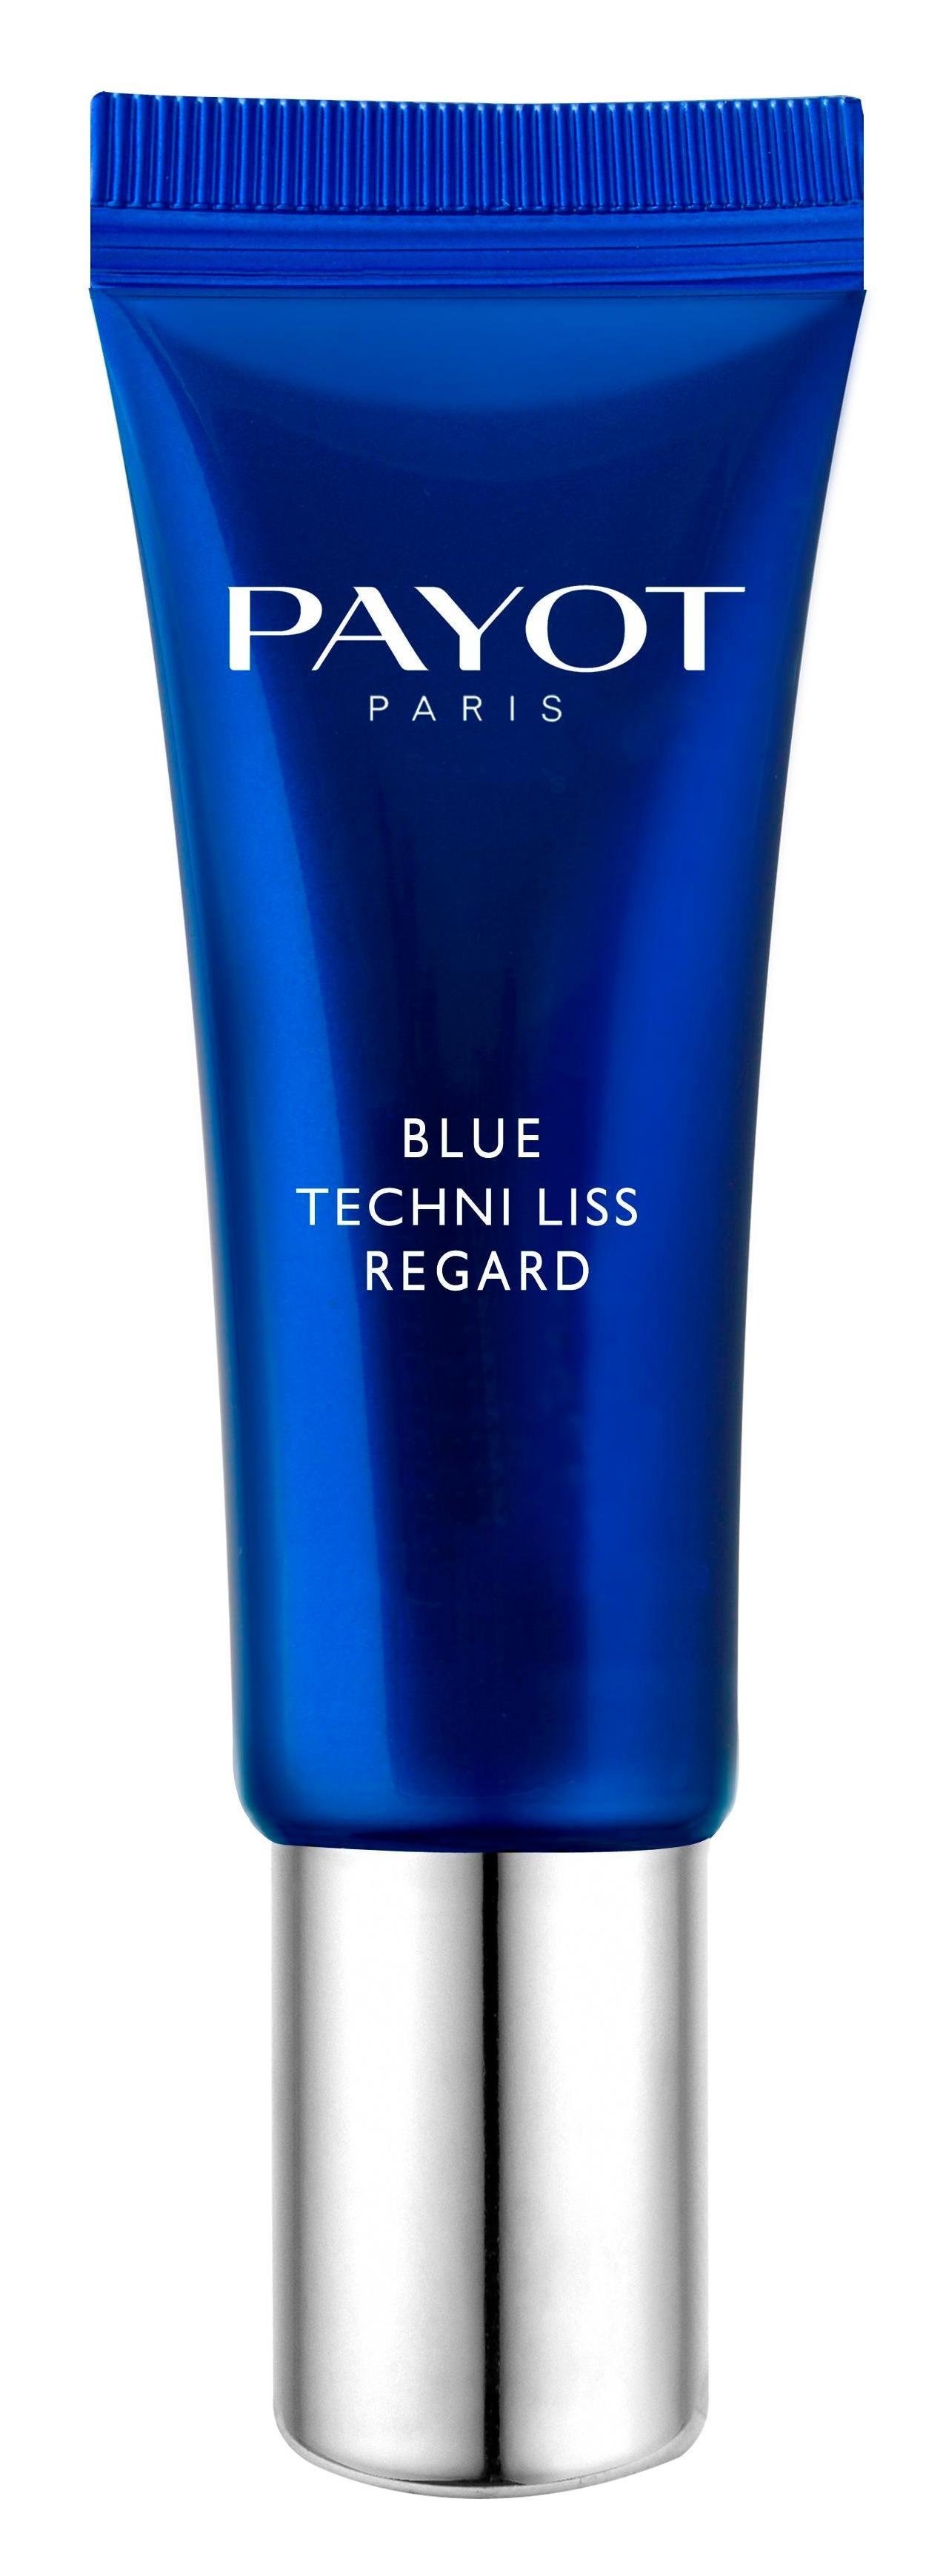 Payot крем-гель хроноактивный для кожи вокруг глаз / blue techni liss 15 мл